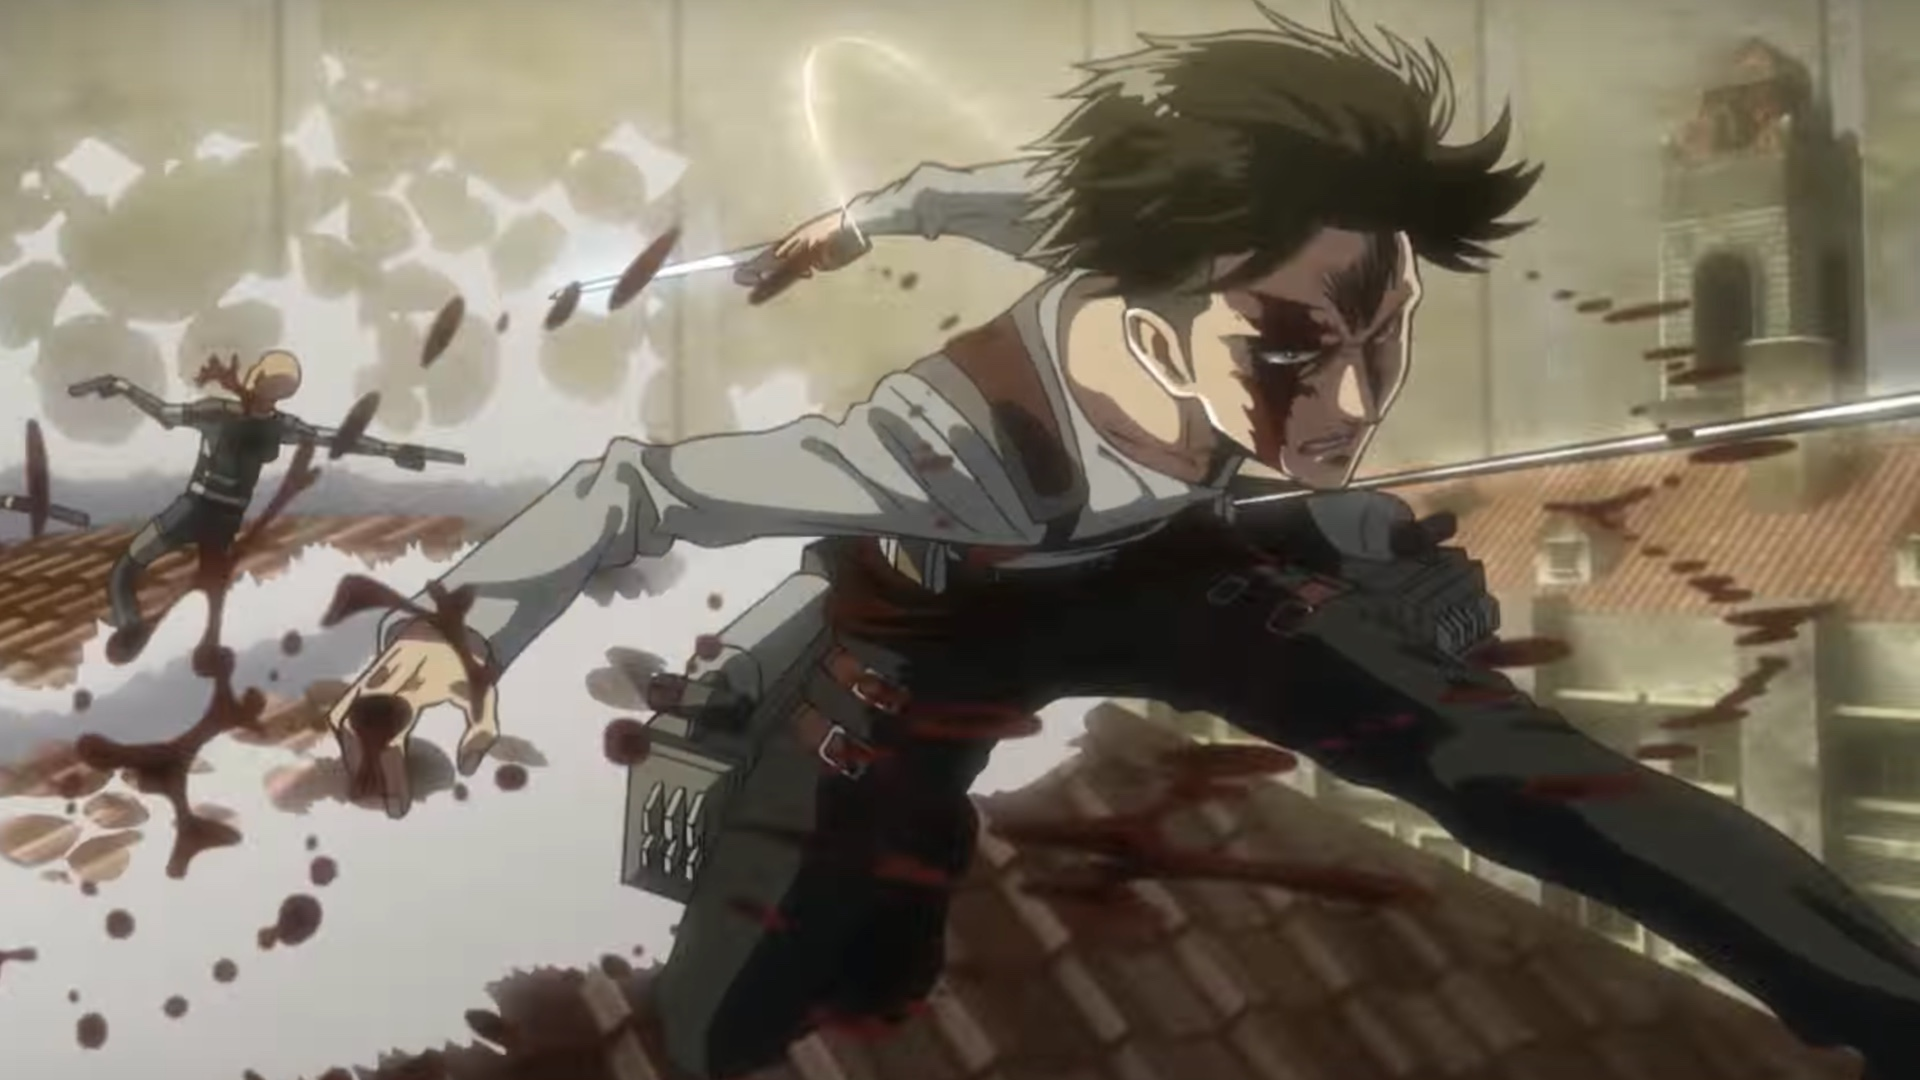 attack-on-titan-season-3-world-premiere-event-trailer-social.jpg